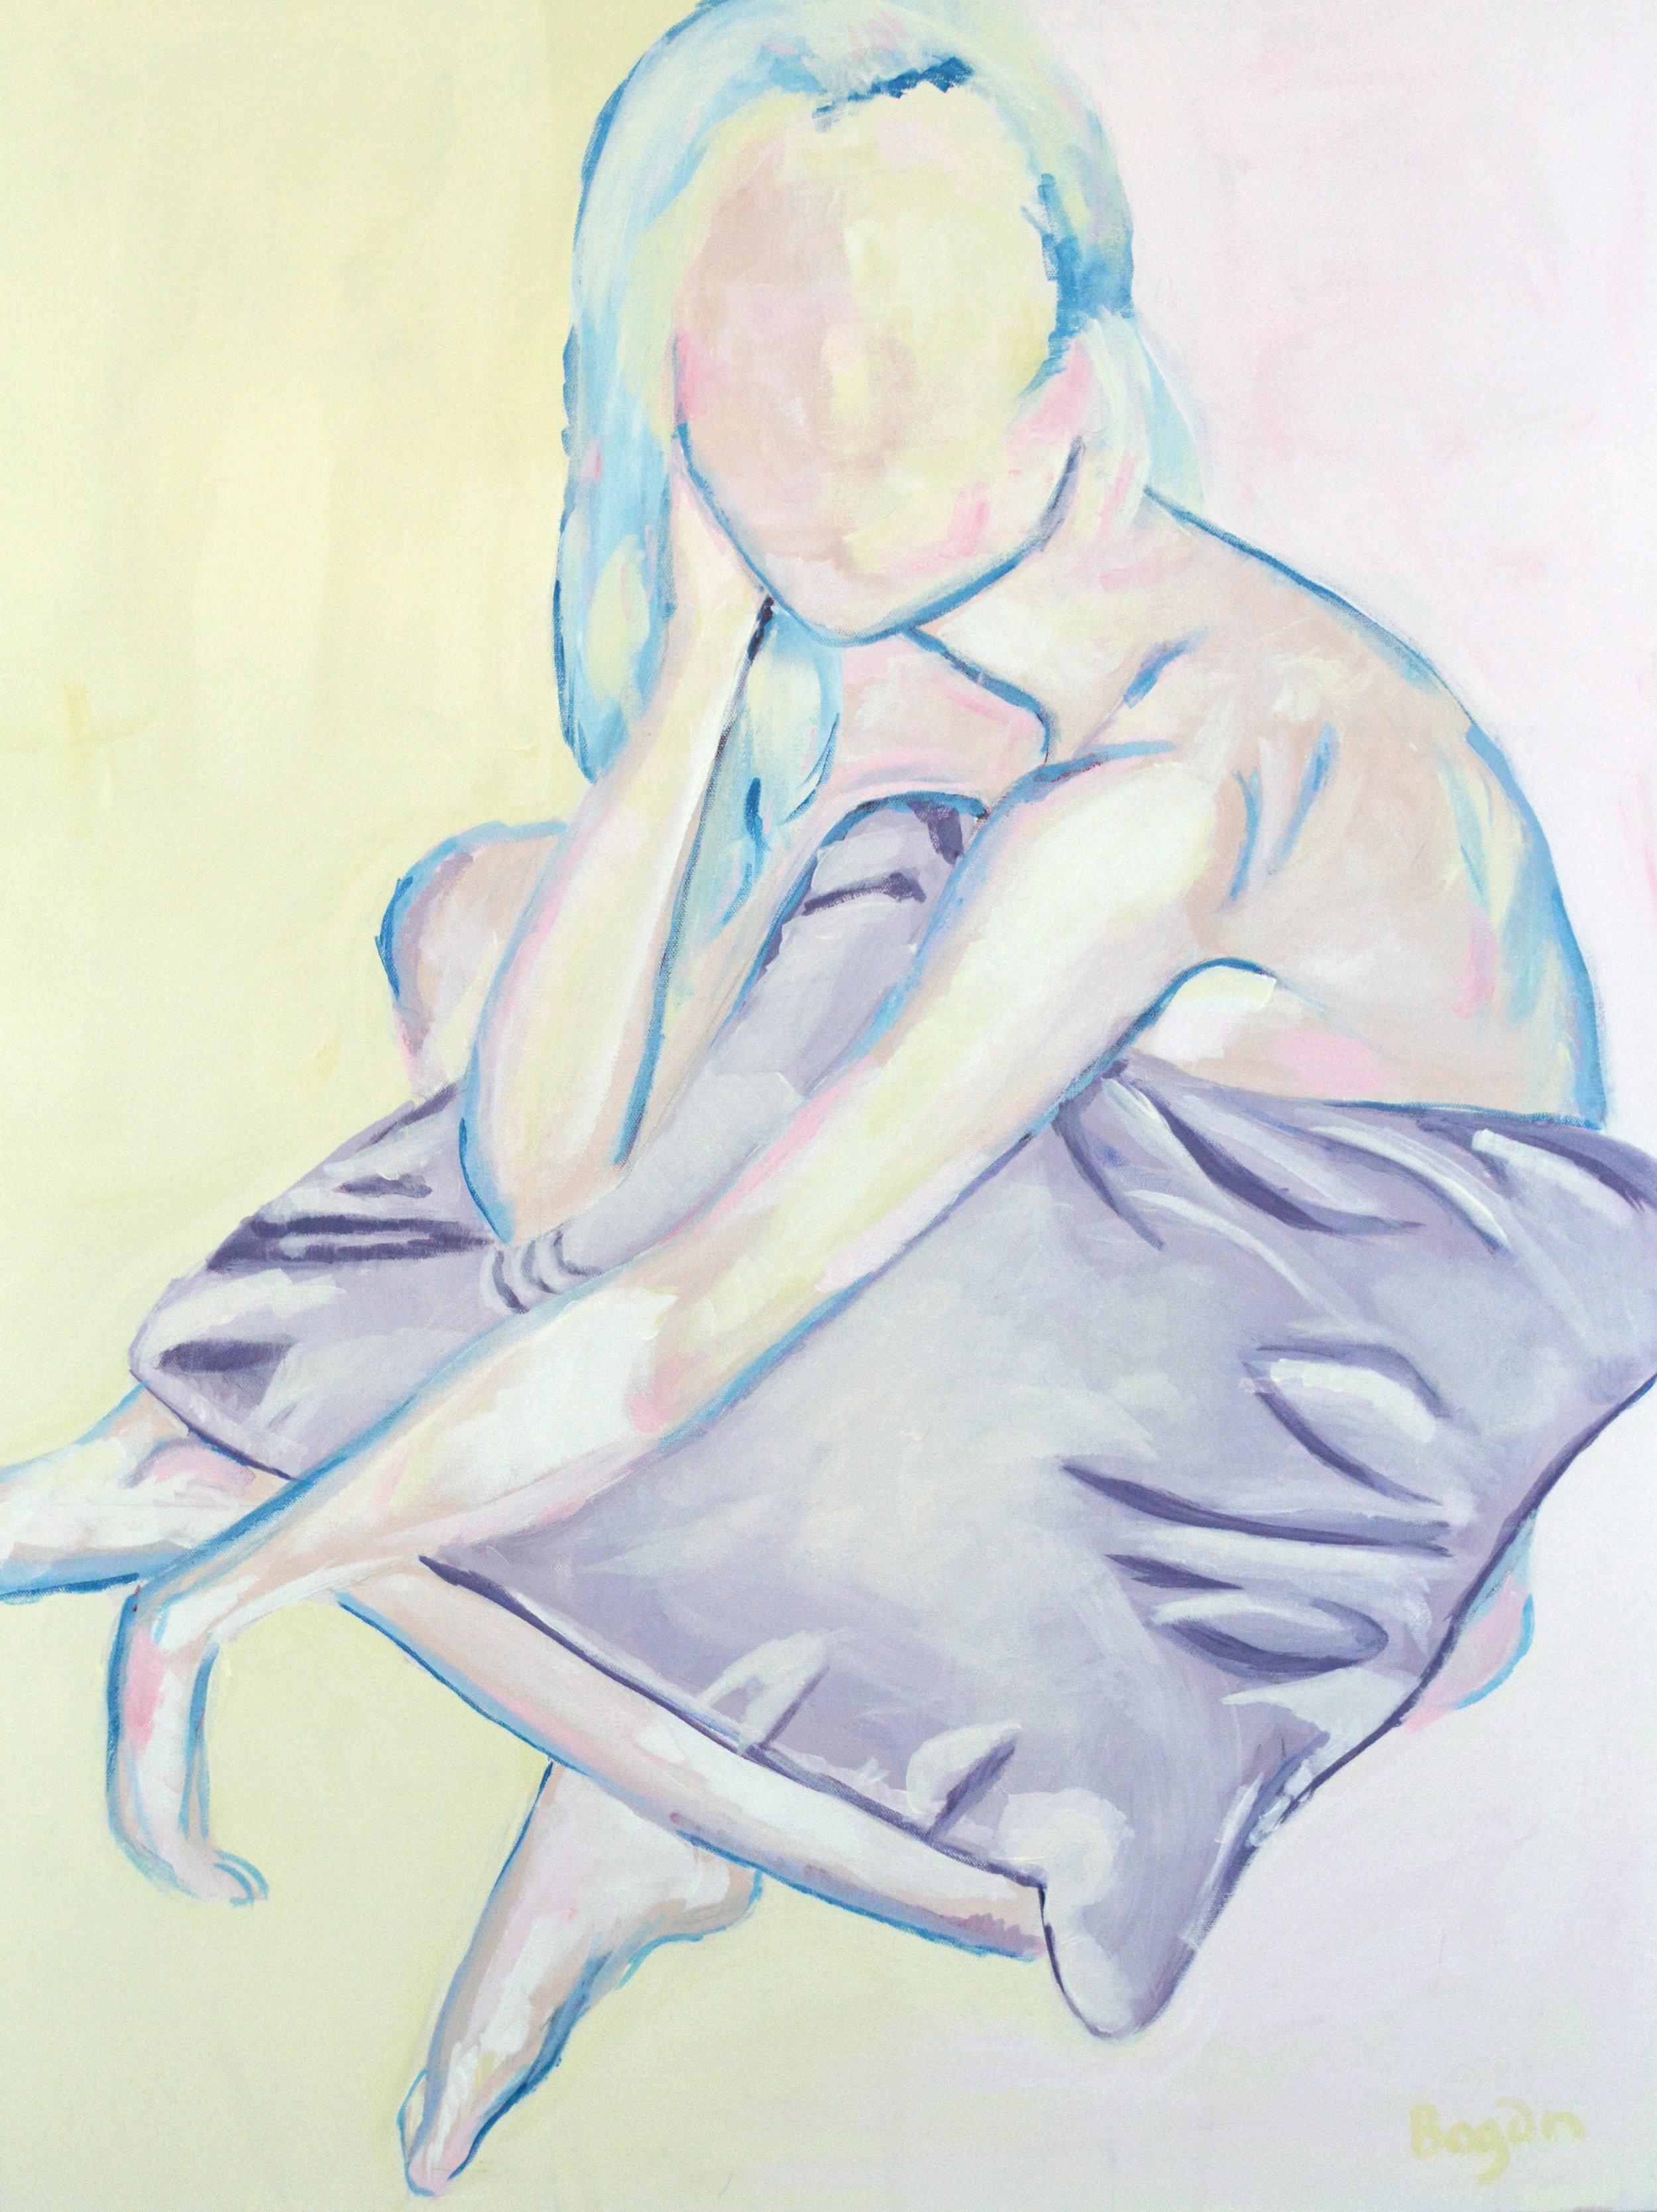 Pillow - 30X40 Acrylic on Canvas$675